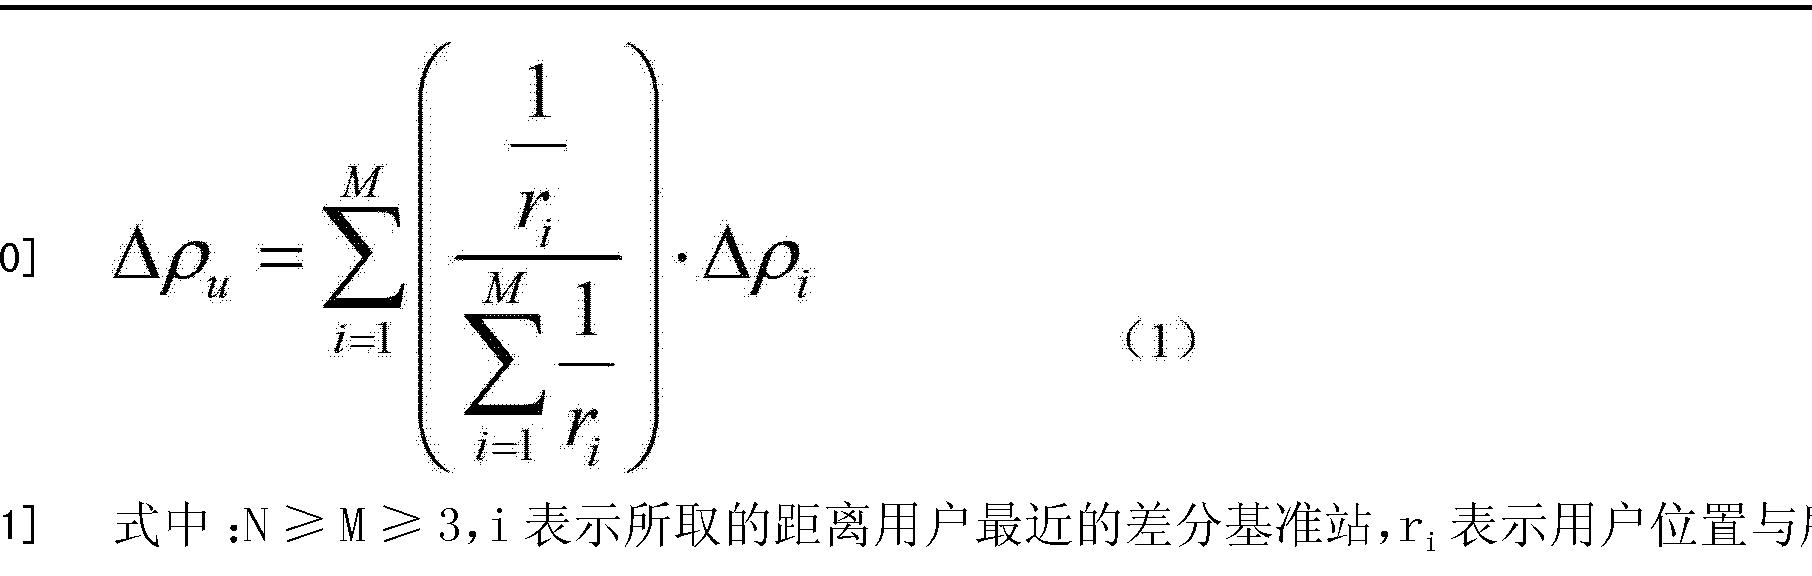 Figure CN102788985AD00041